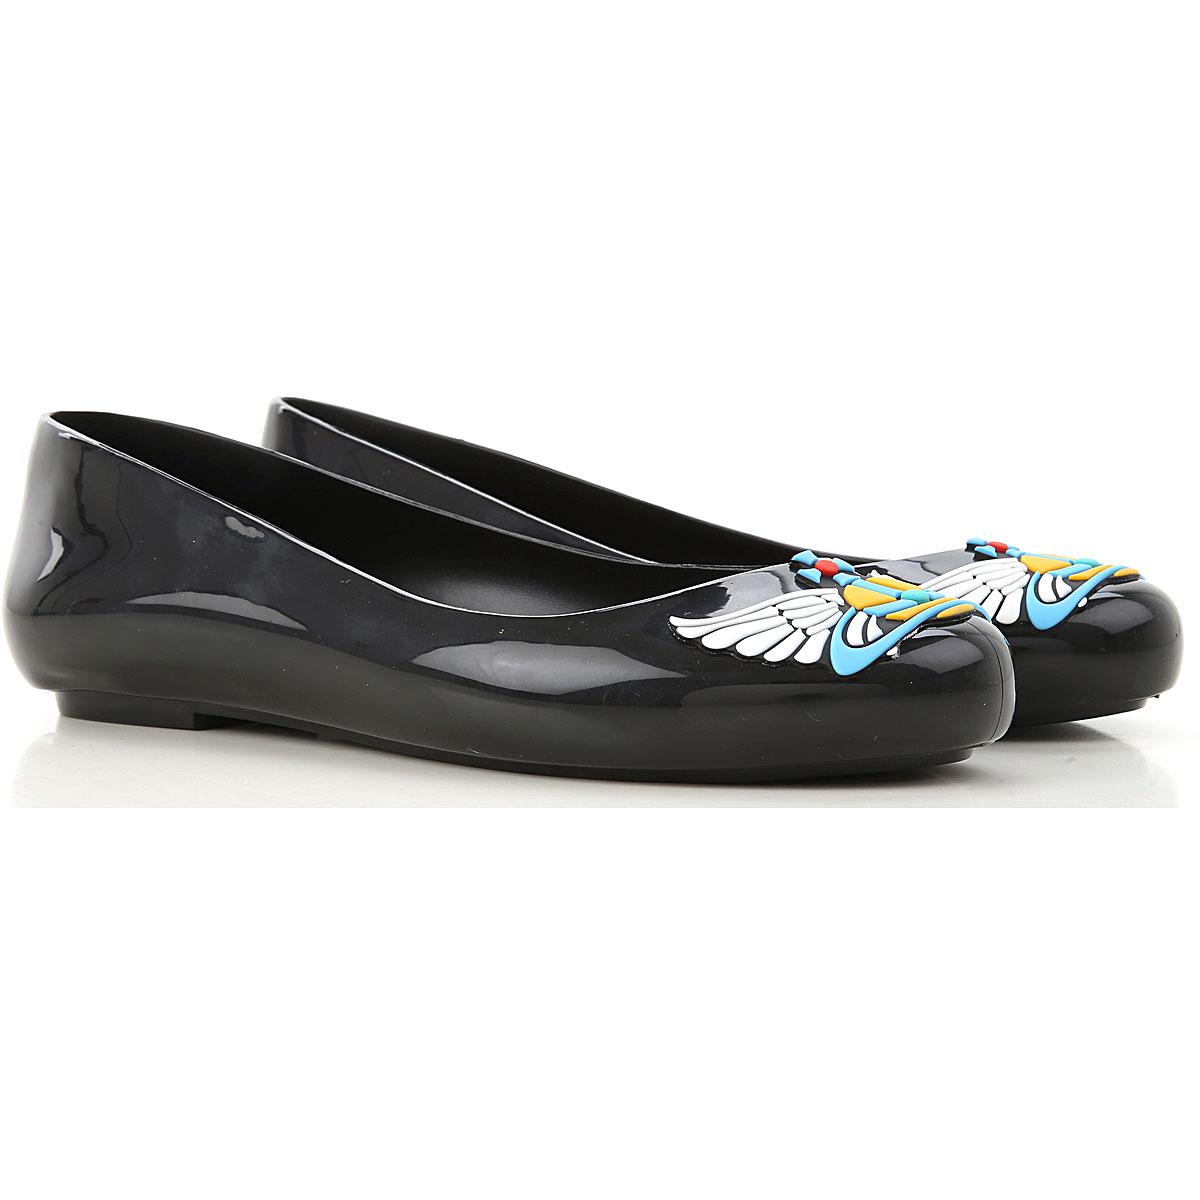 Melissa Ballet Flats Ballerina Shoes for Women On Sale, Black, PVC, 2019, USA 5 - EUR 35/36 USA 6 - EUR 37 USA 7 - EUR 38 USA 8 - EUR 39 USA 9 - EUR 4